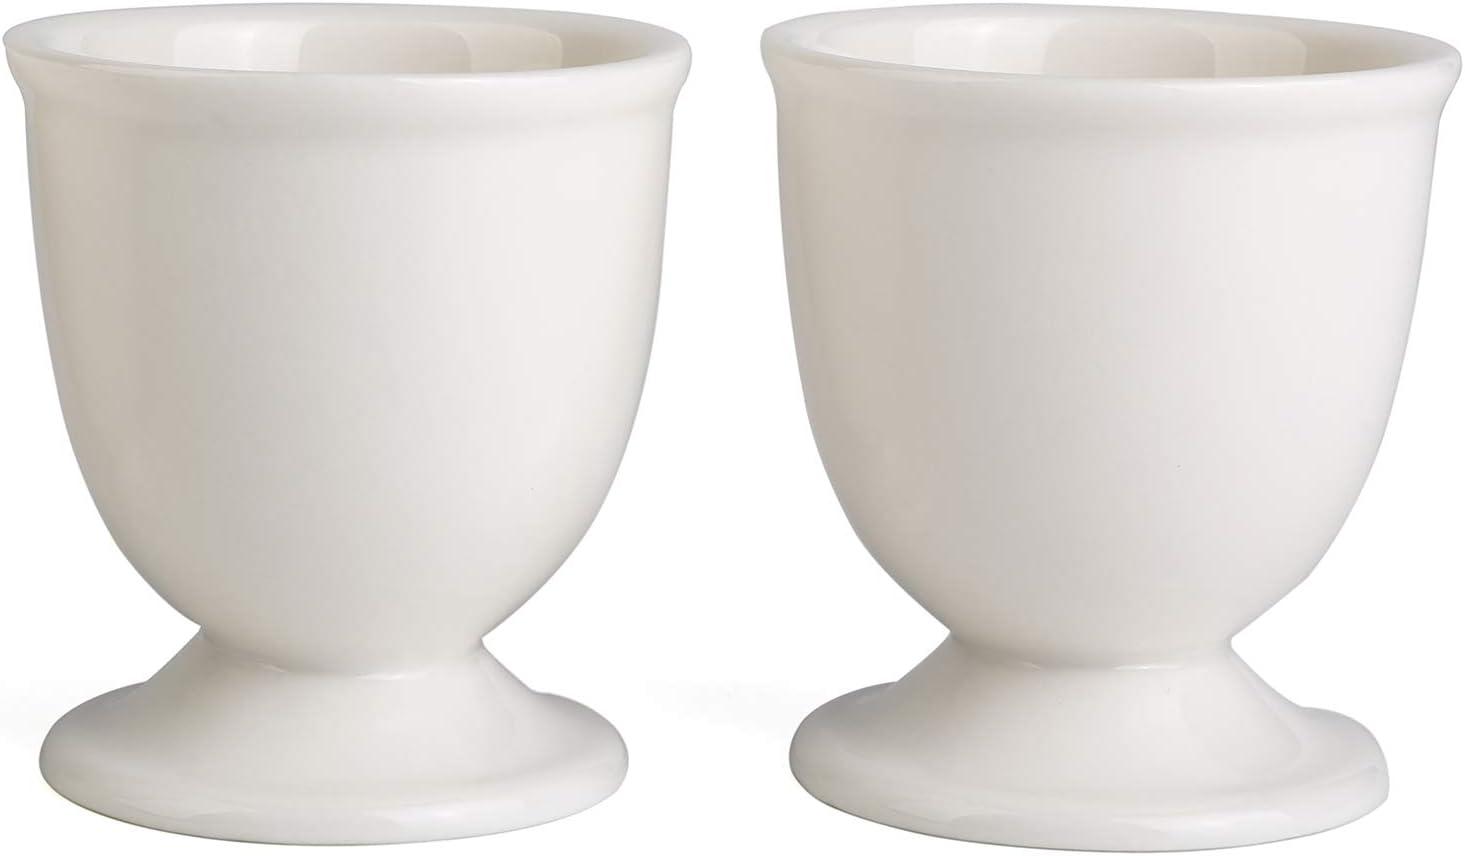 Ceramic Egg Cups Set of 2 for Soft Hard Boiled Eggs